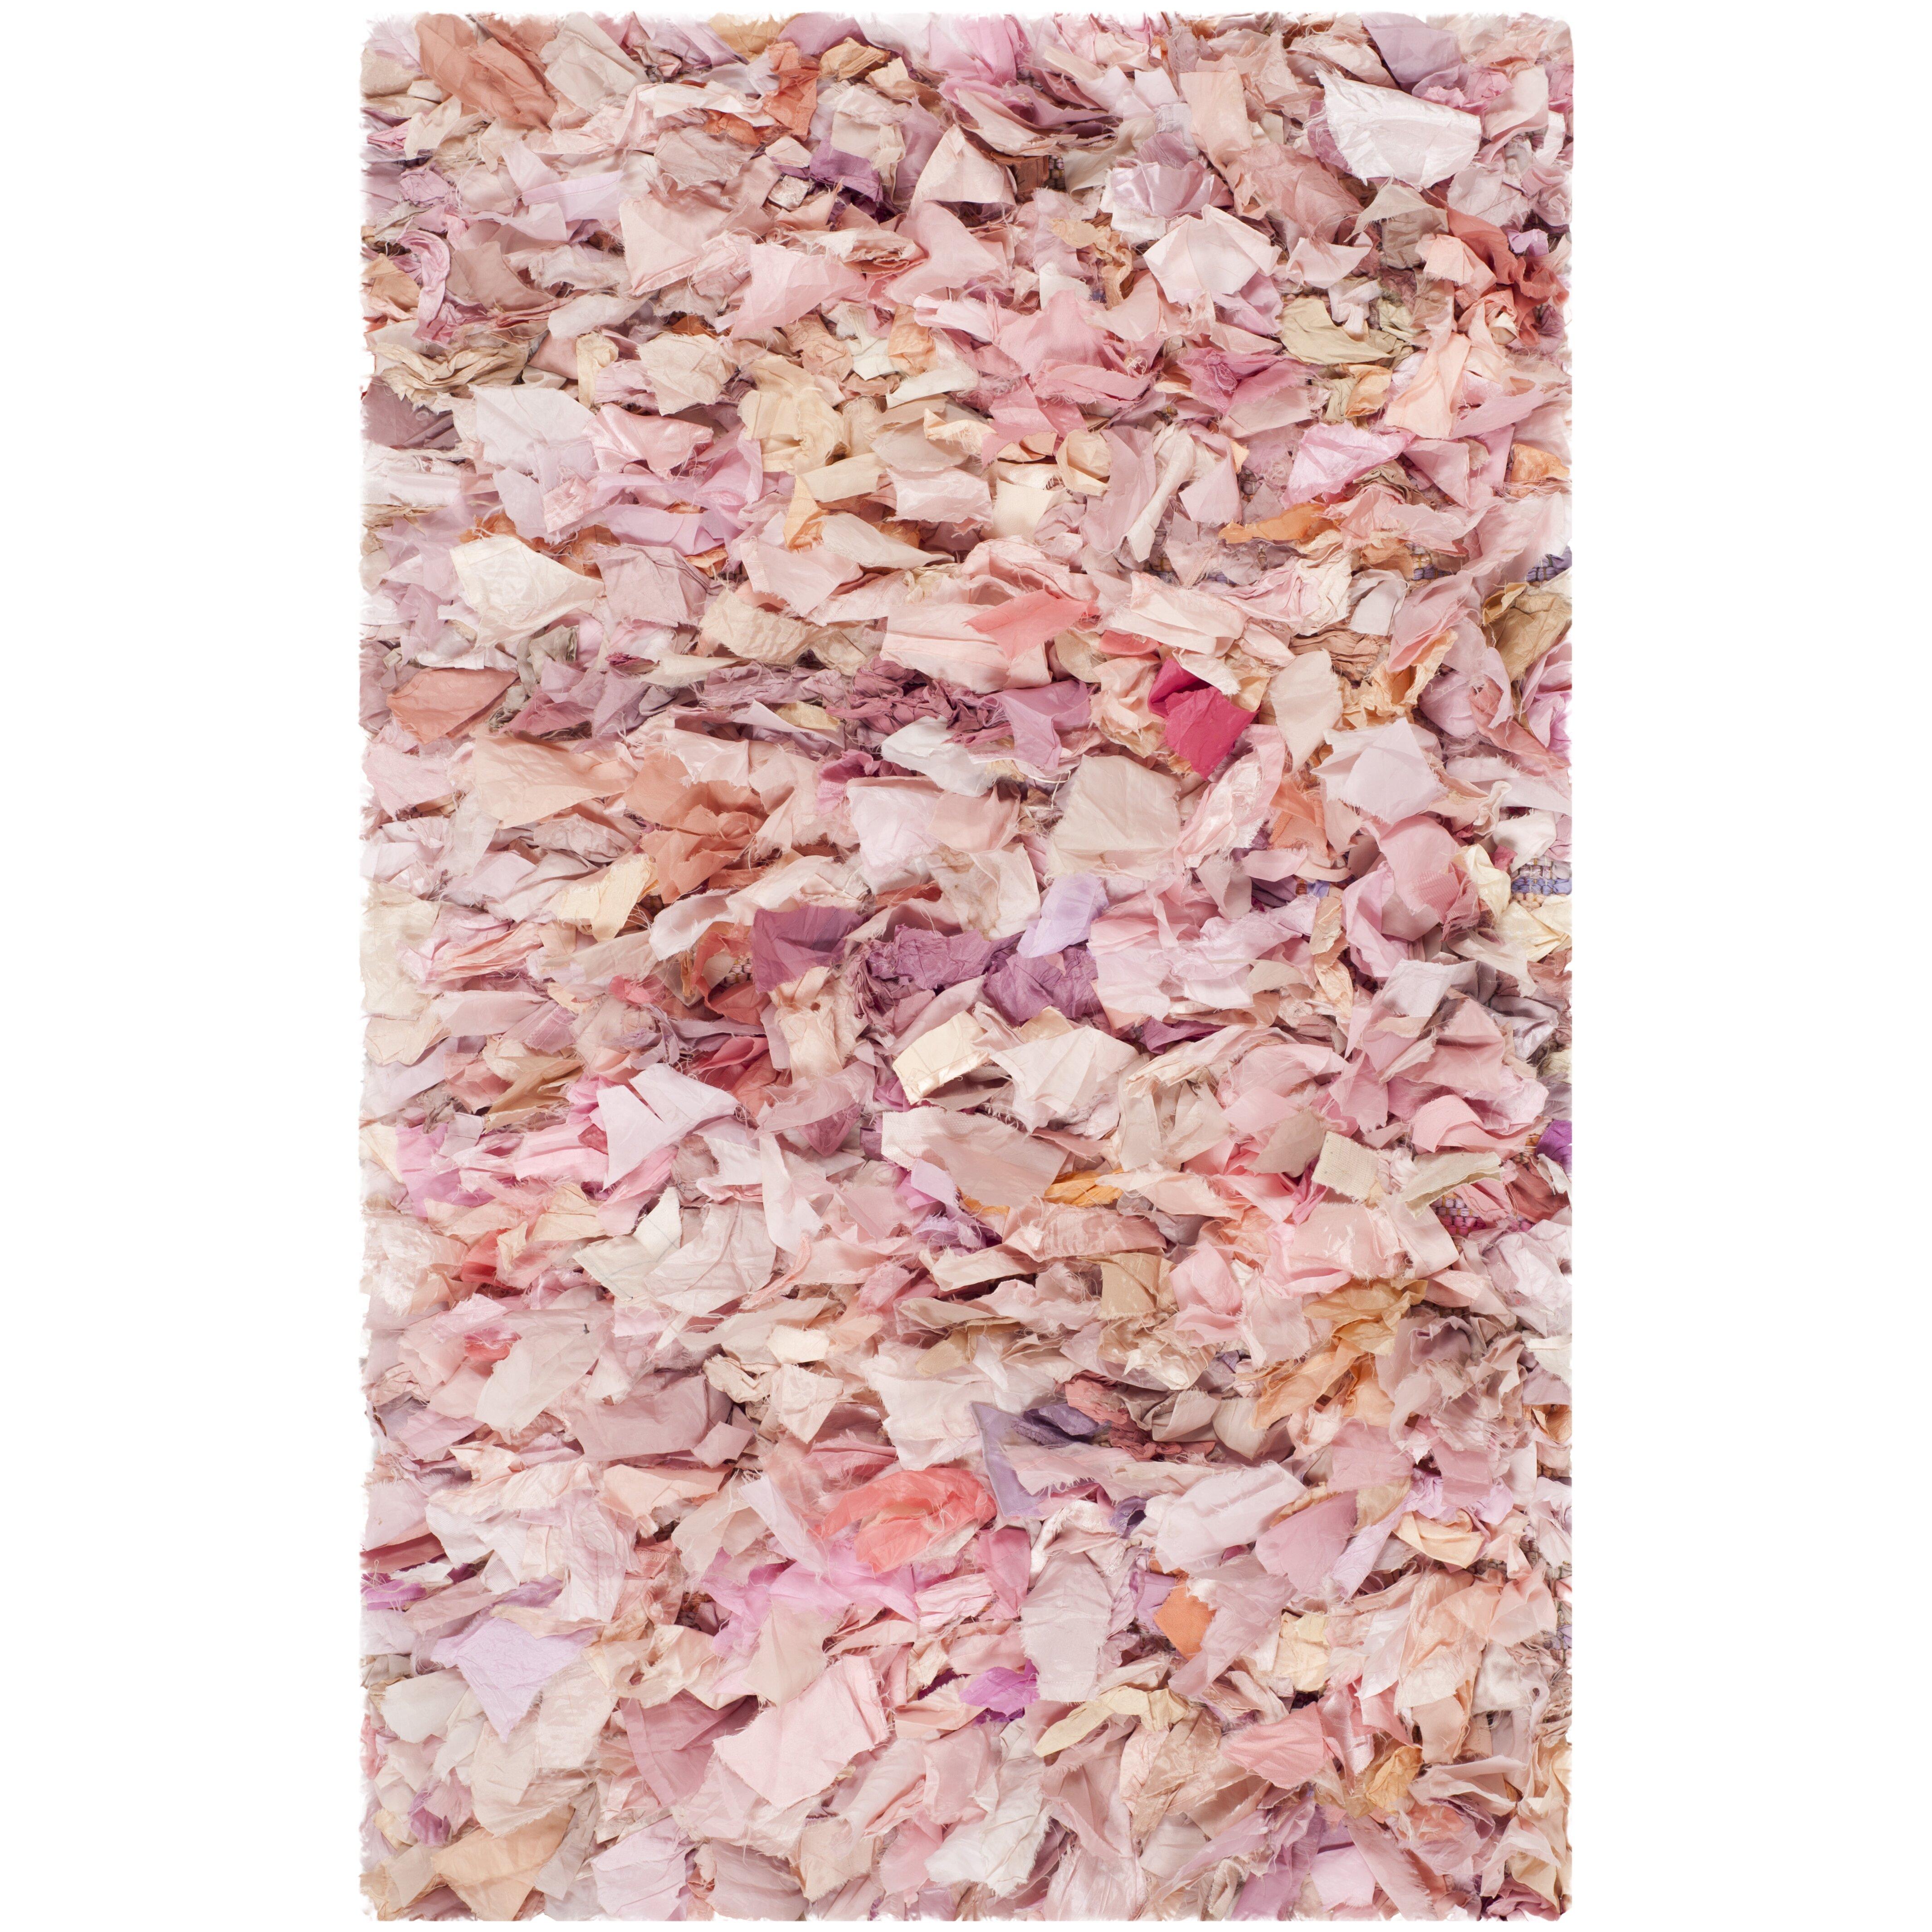 Safavieh Ivory Pink Shag Area Rug Reviews Wayfair